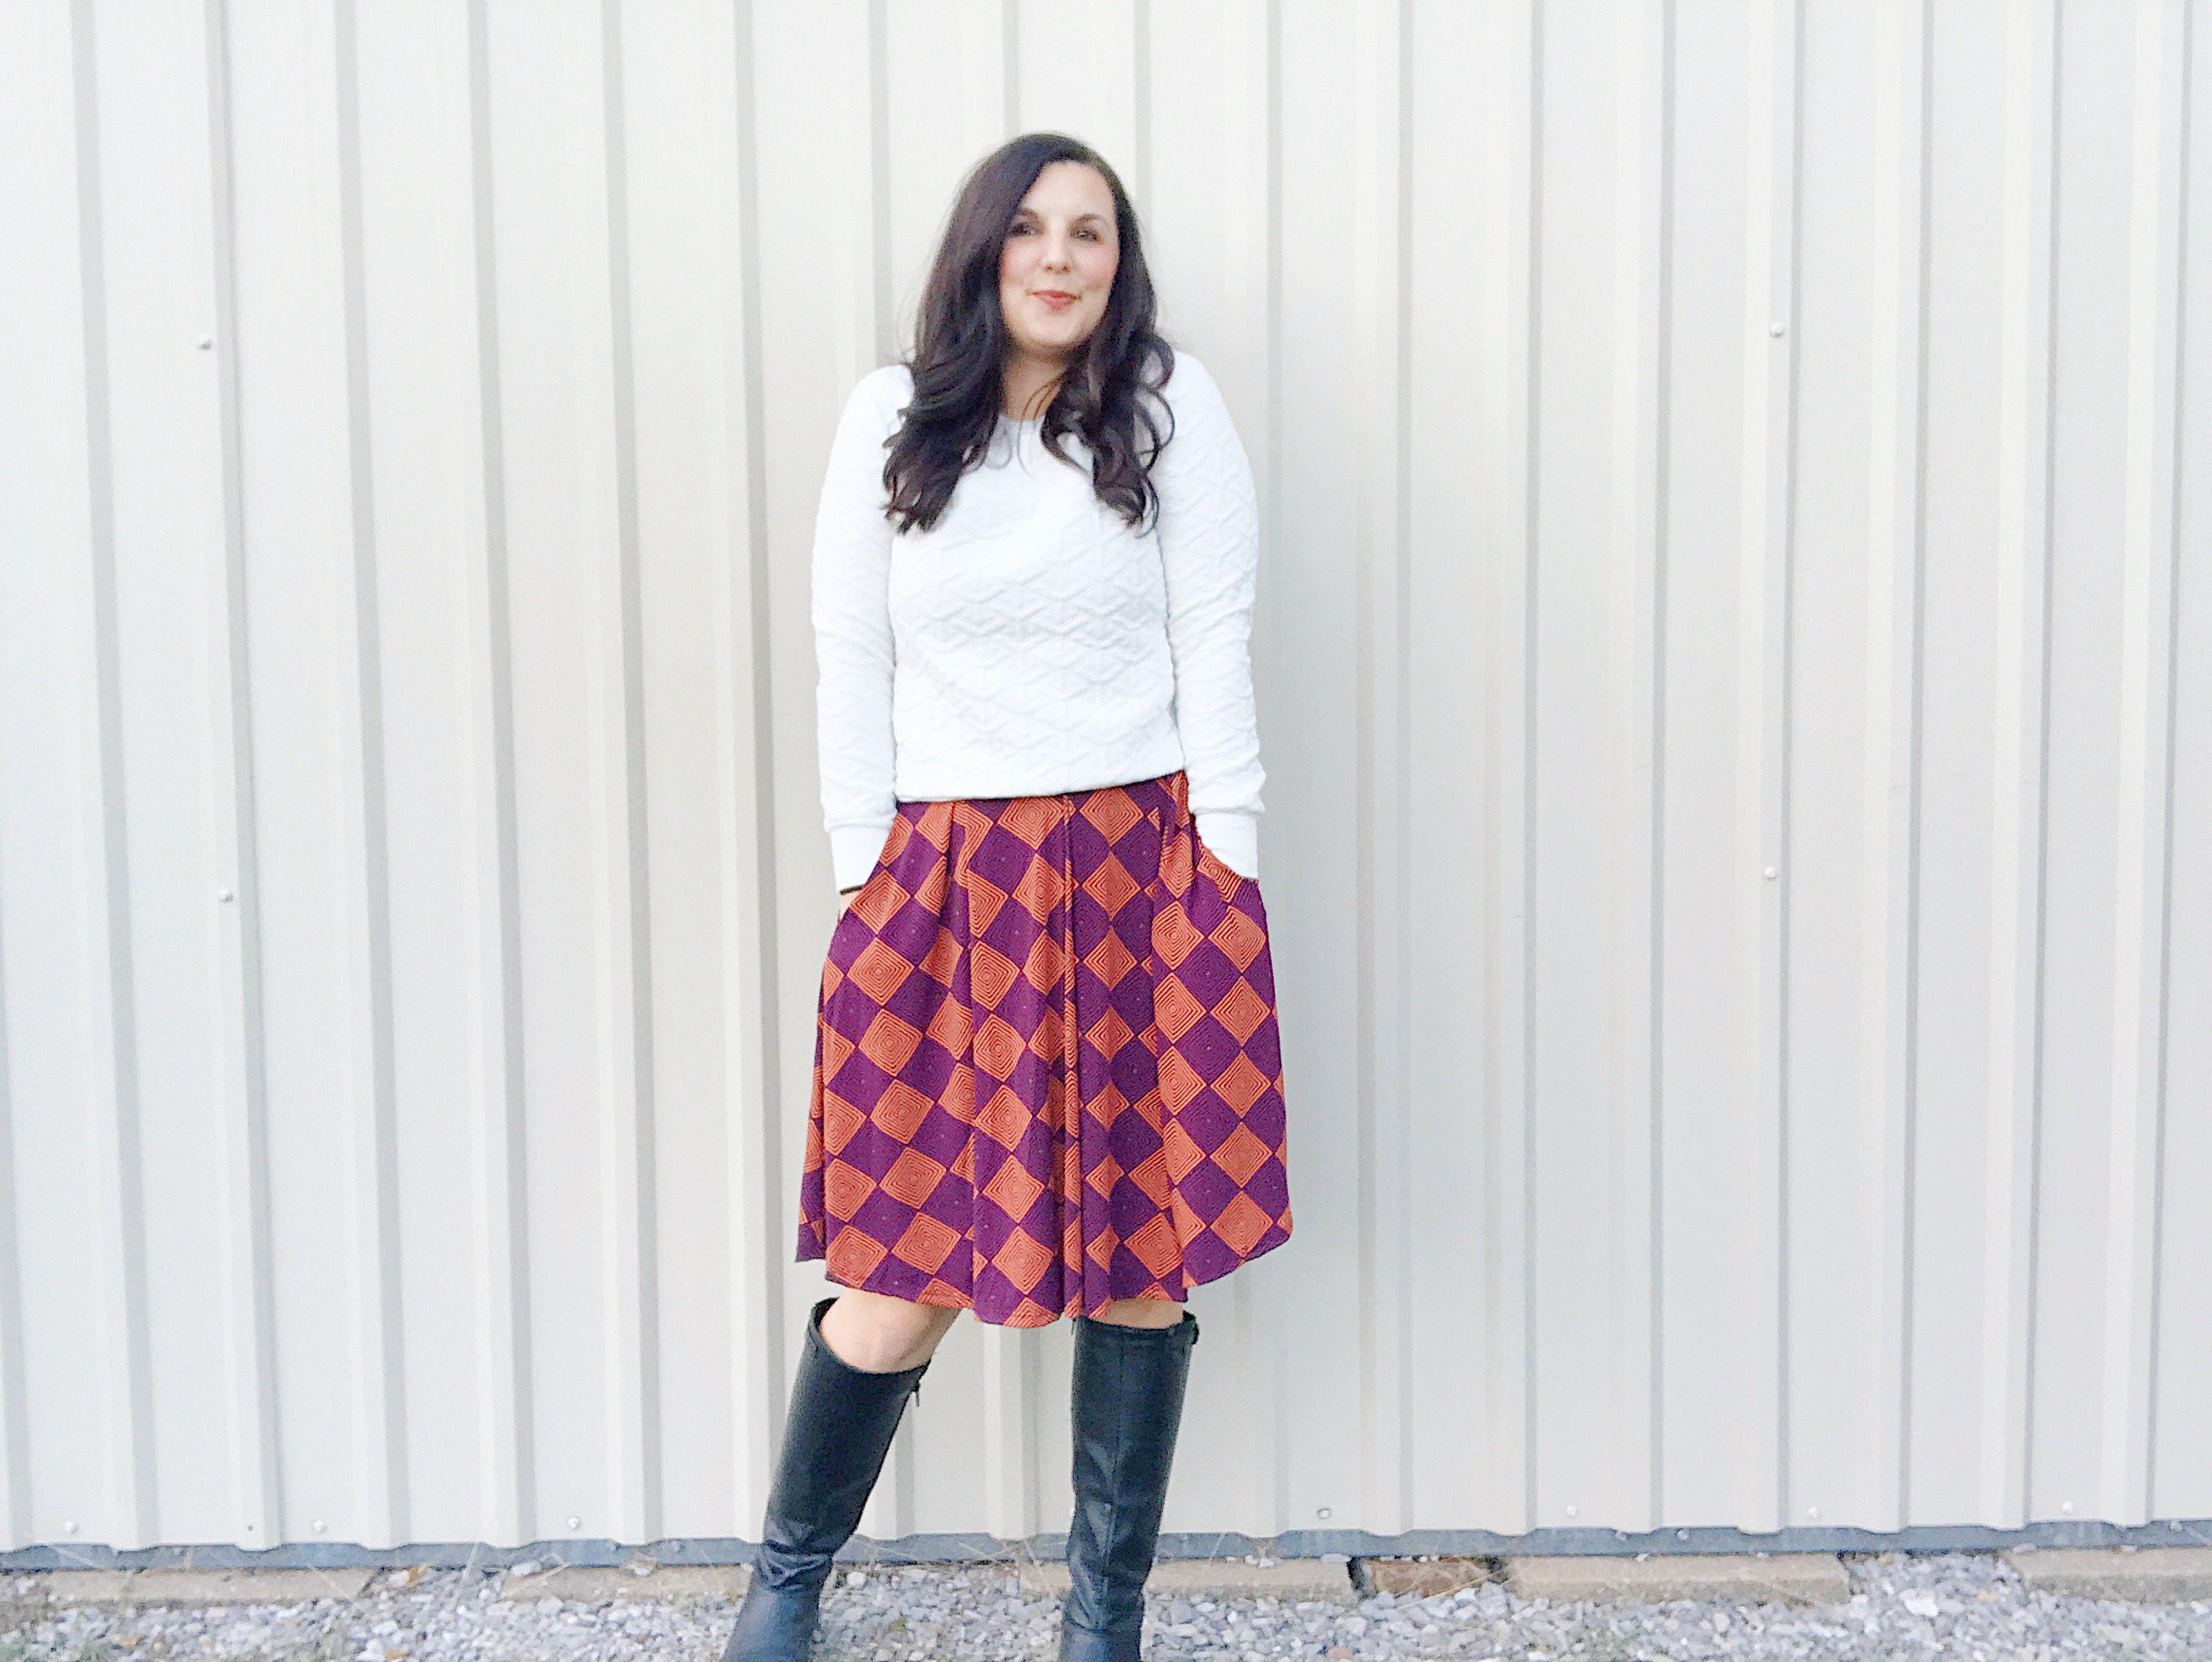 ae977ff83b ... sweater is perfect for cooler weather. #lularoe #lularoemadison  #skirtsandsweaters #pleatedskirt #skirtwithpockets #workoutfit #fallfashion  #skirts